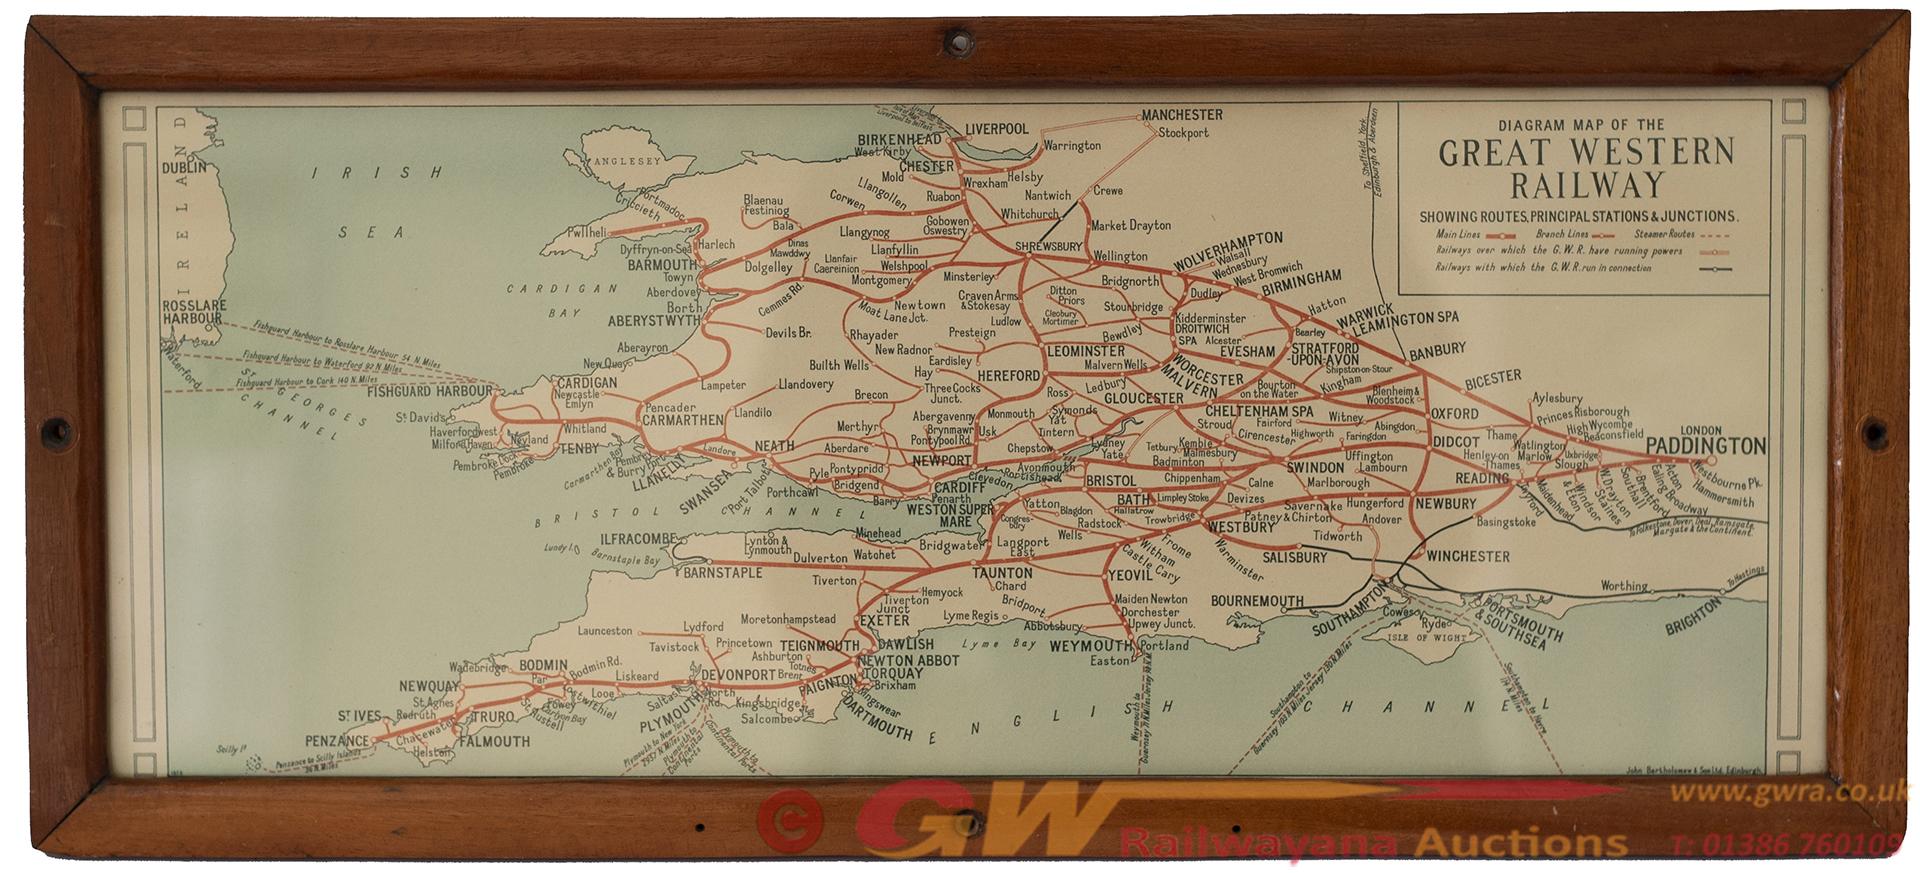 Carriage Print Great Western Railway Diagram Map